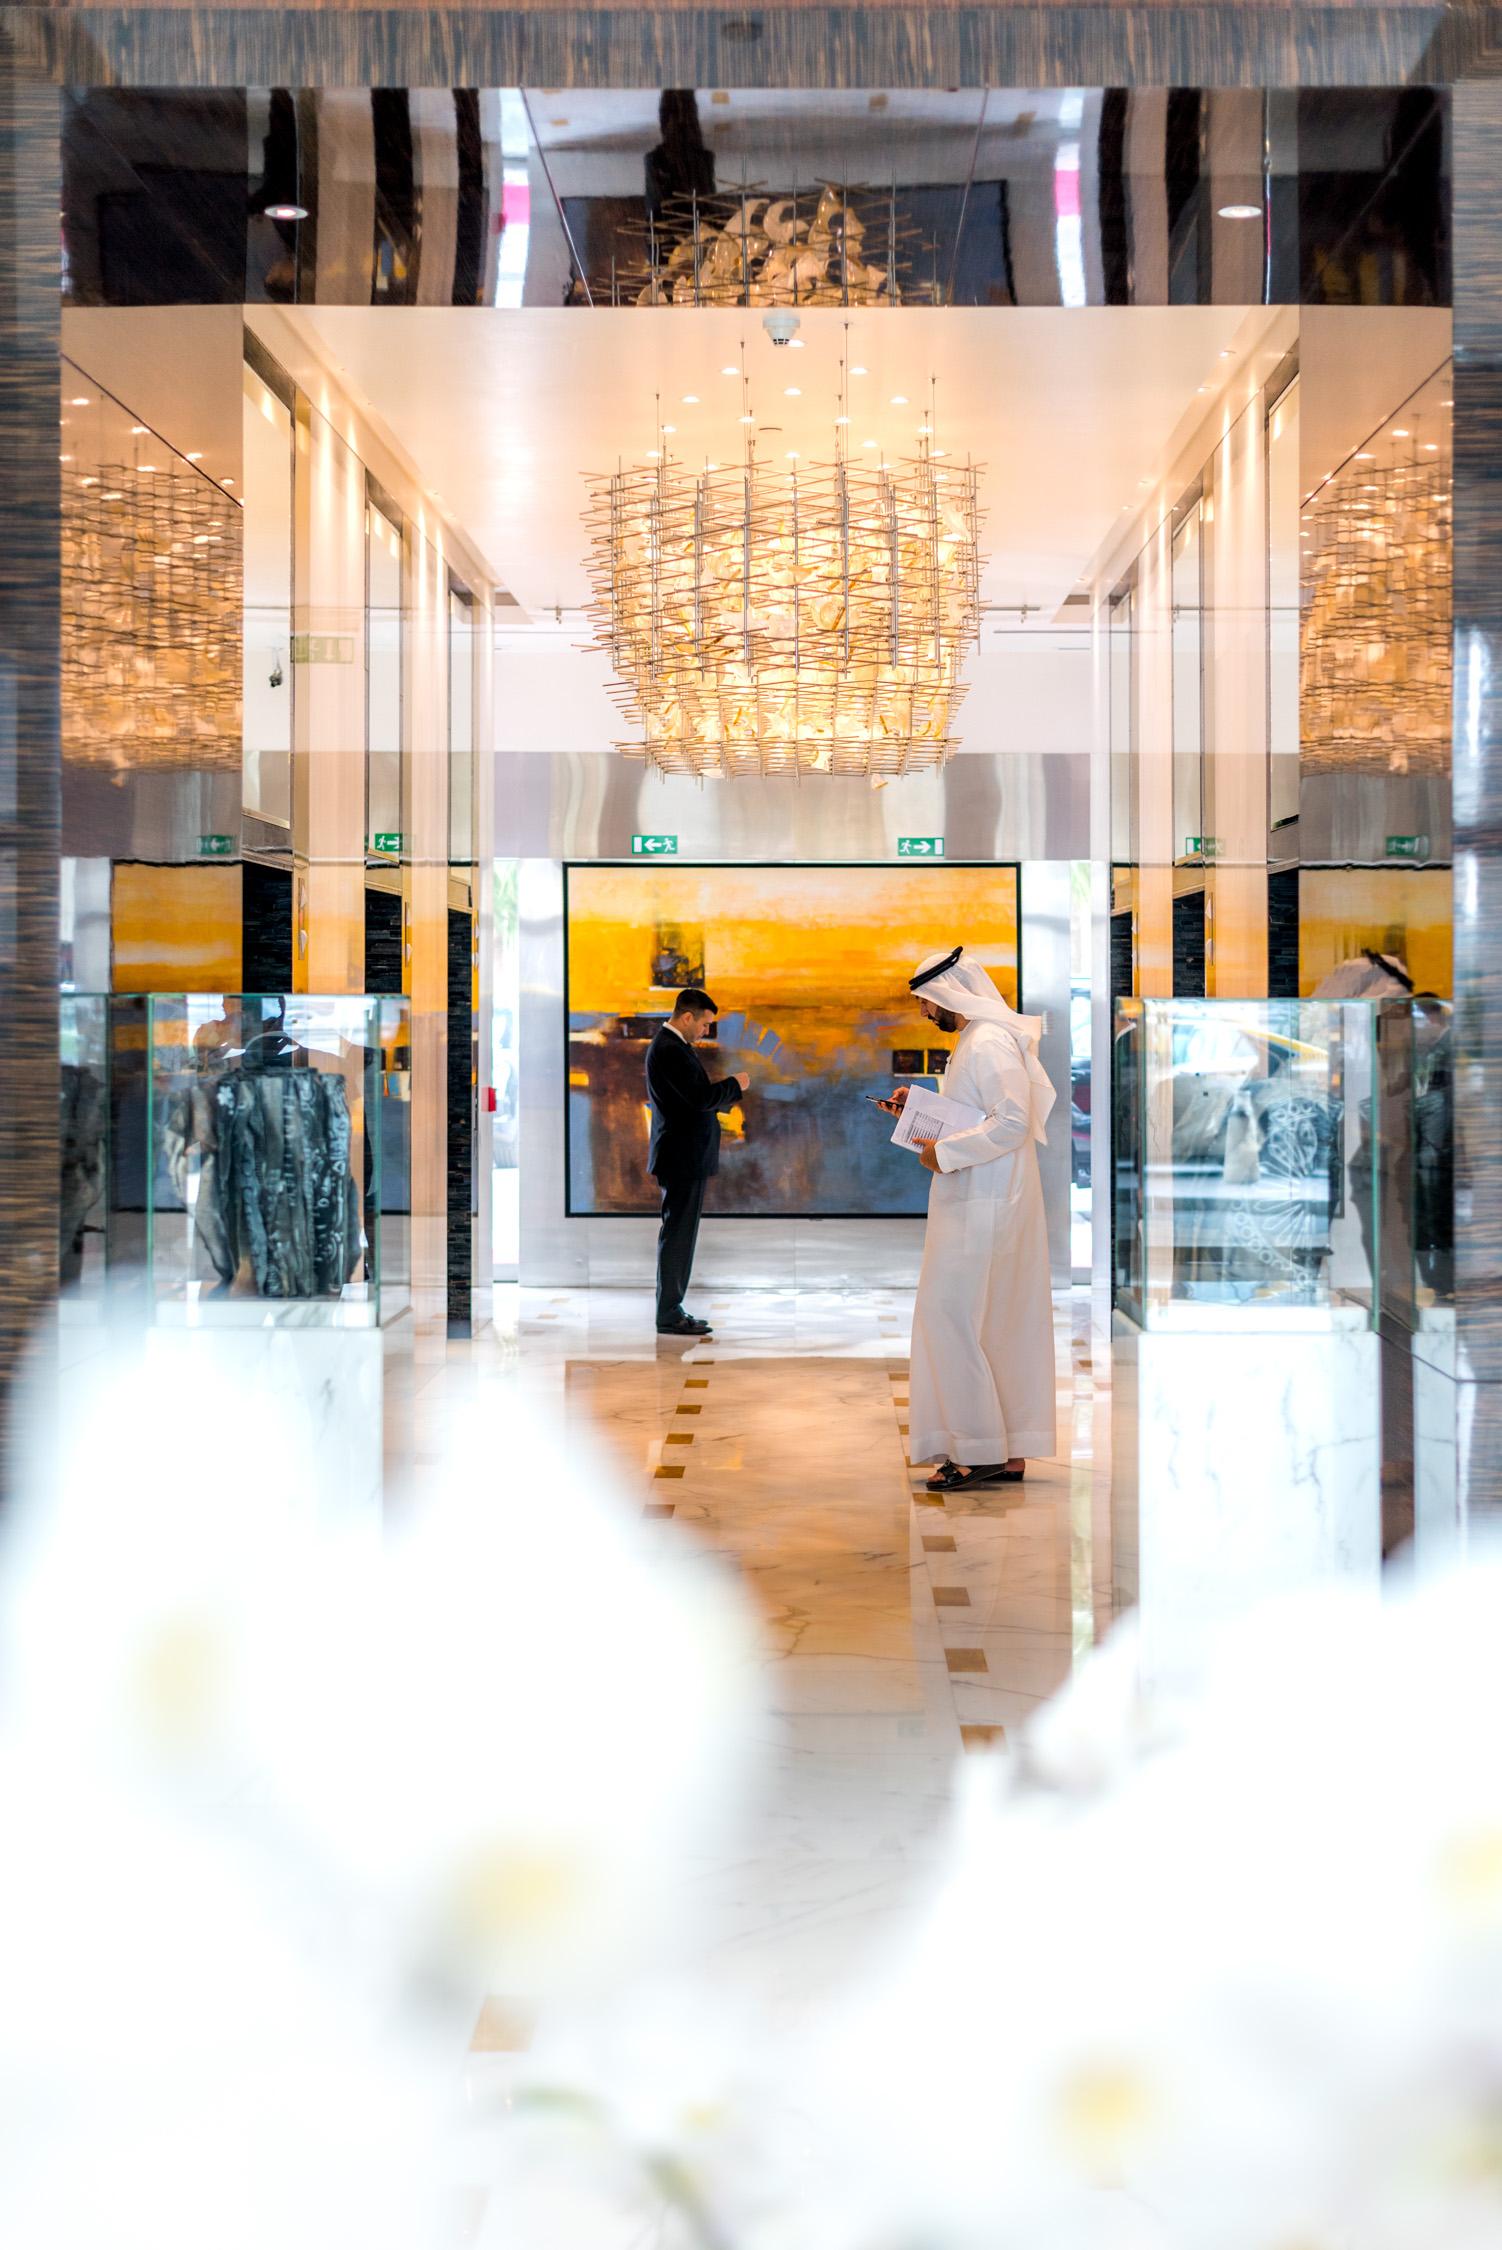 Dubai-377-20180513.jpg